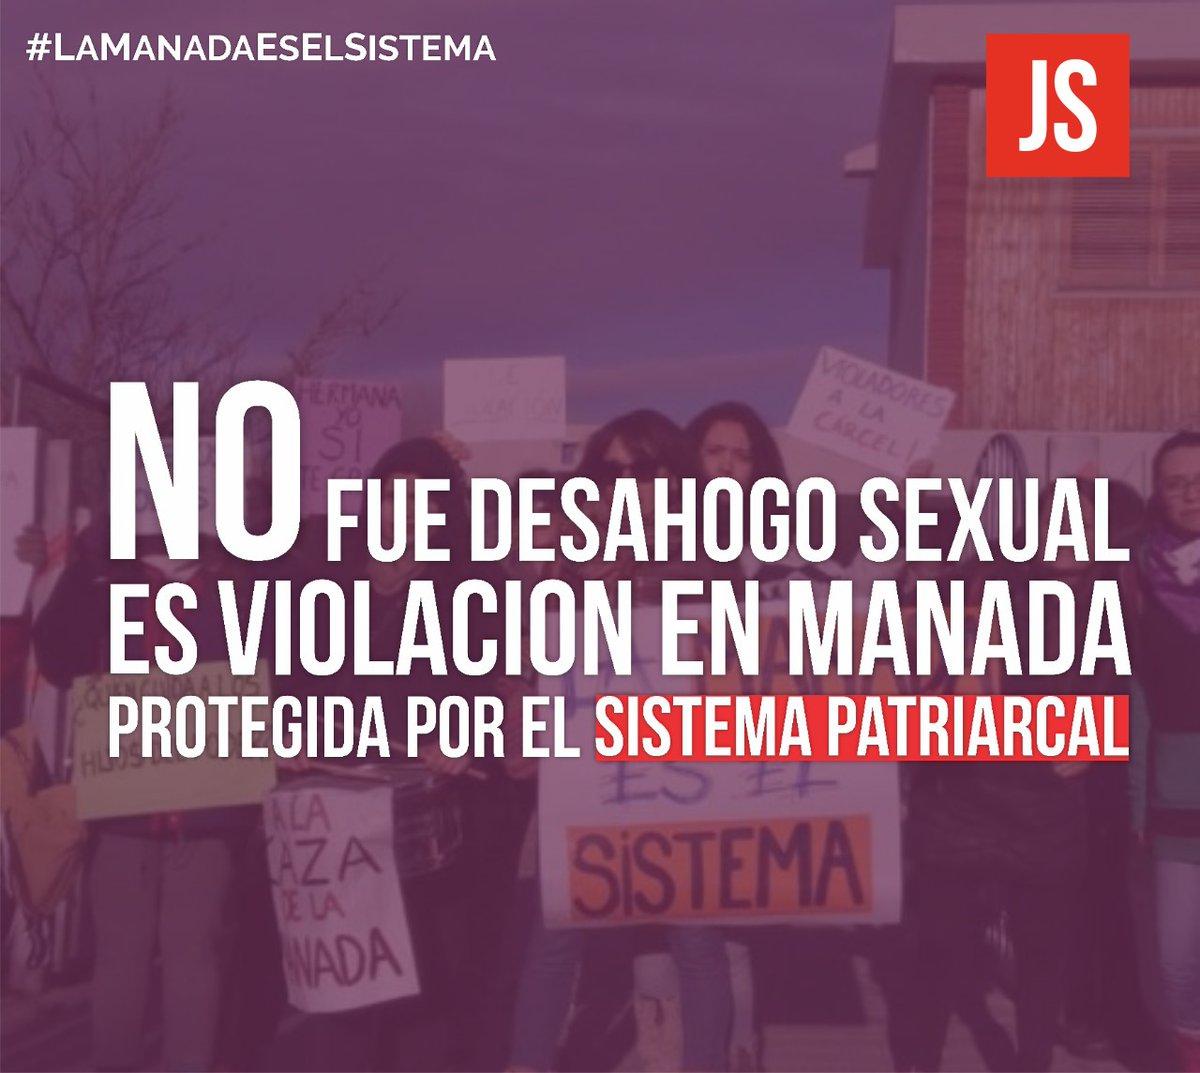 BASTA DE VIOLENCIA MACHISTA!   #MiraComoNosPonemos  #NiUnaMas https://t.co/EJ5lweSb9S